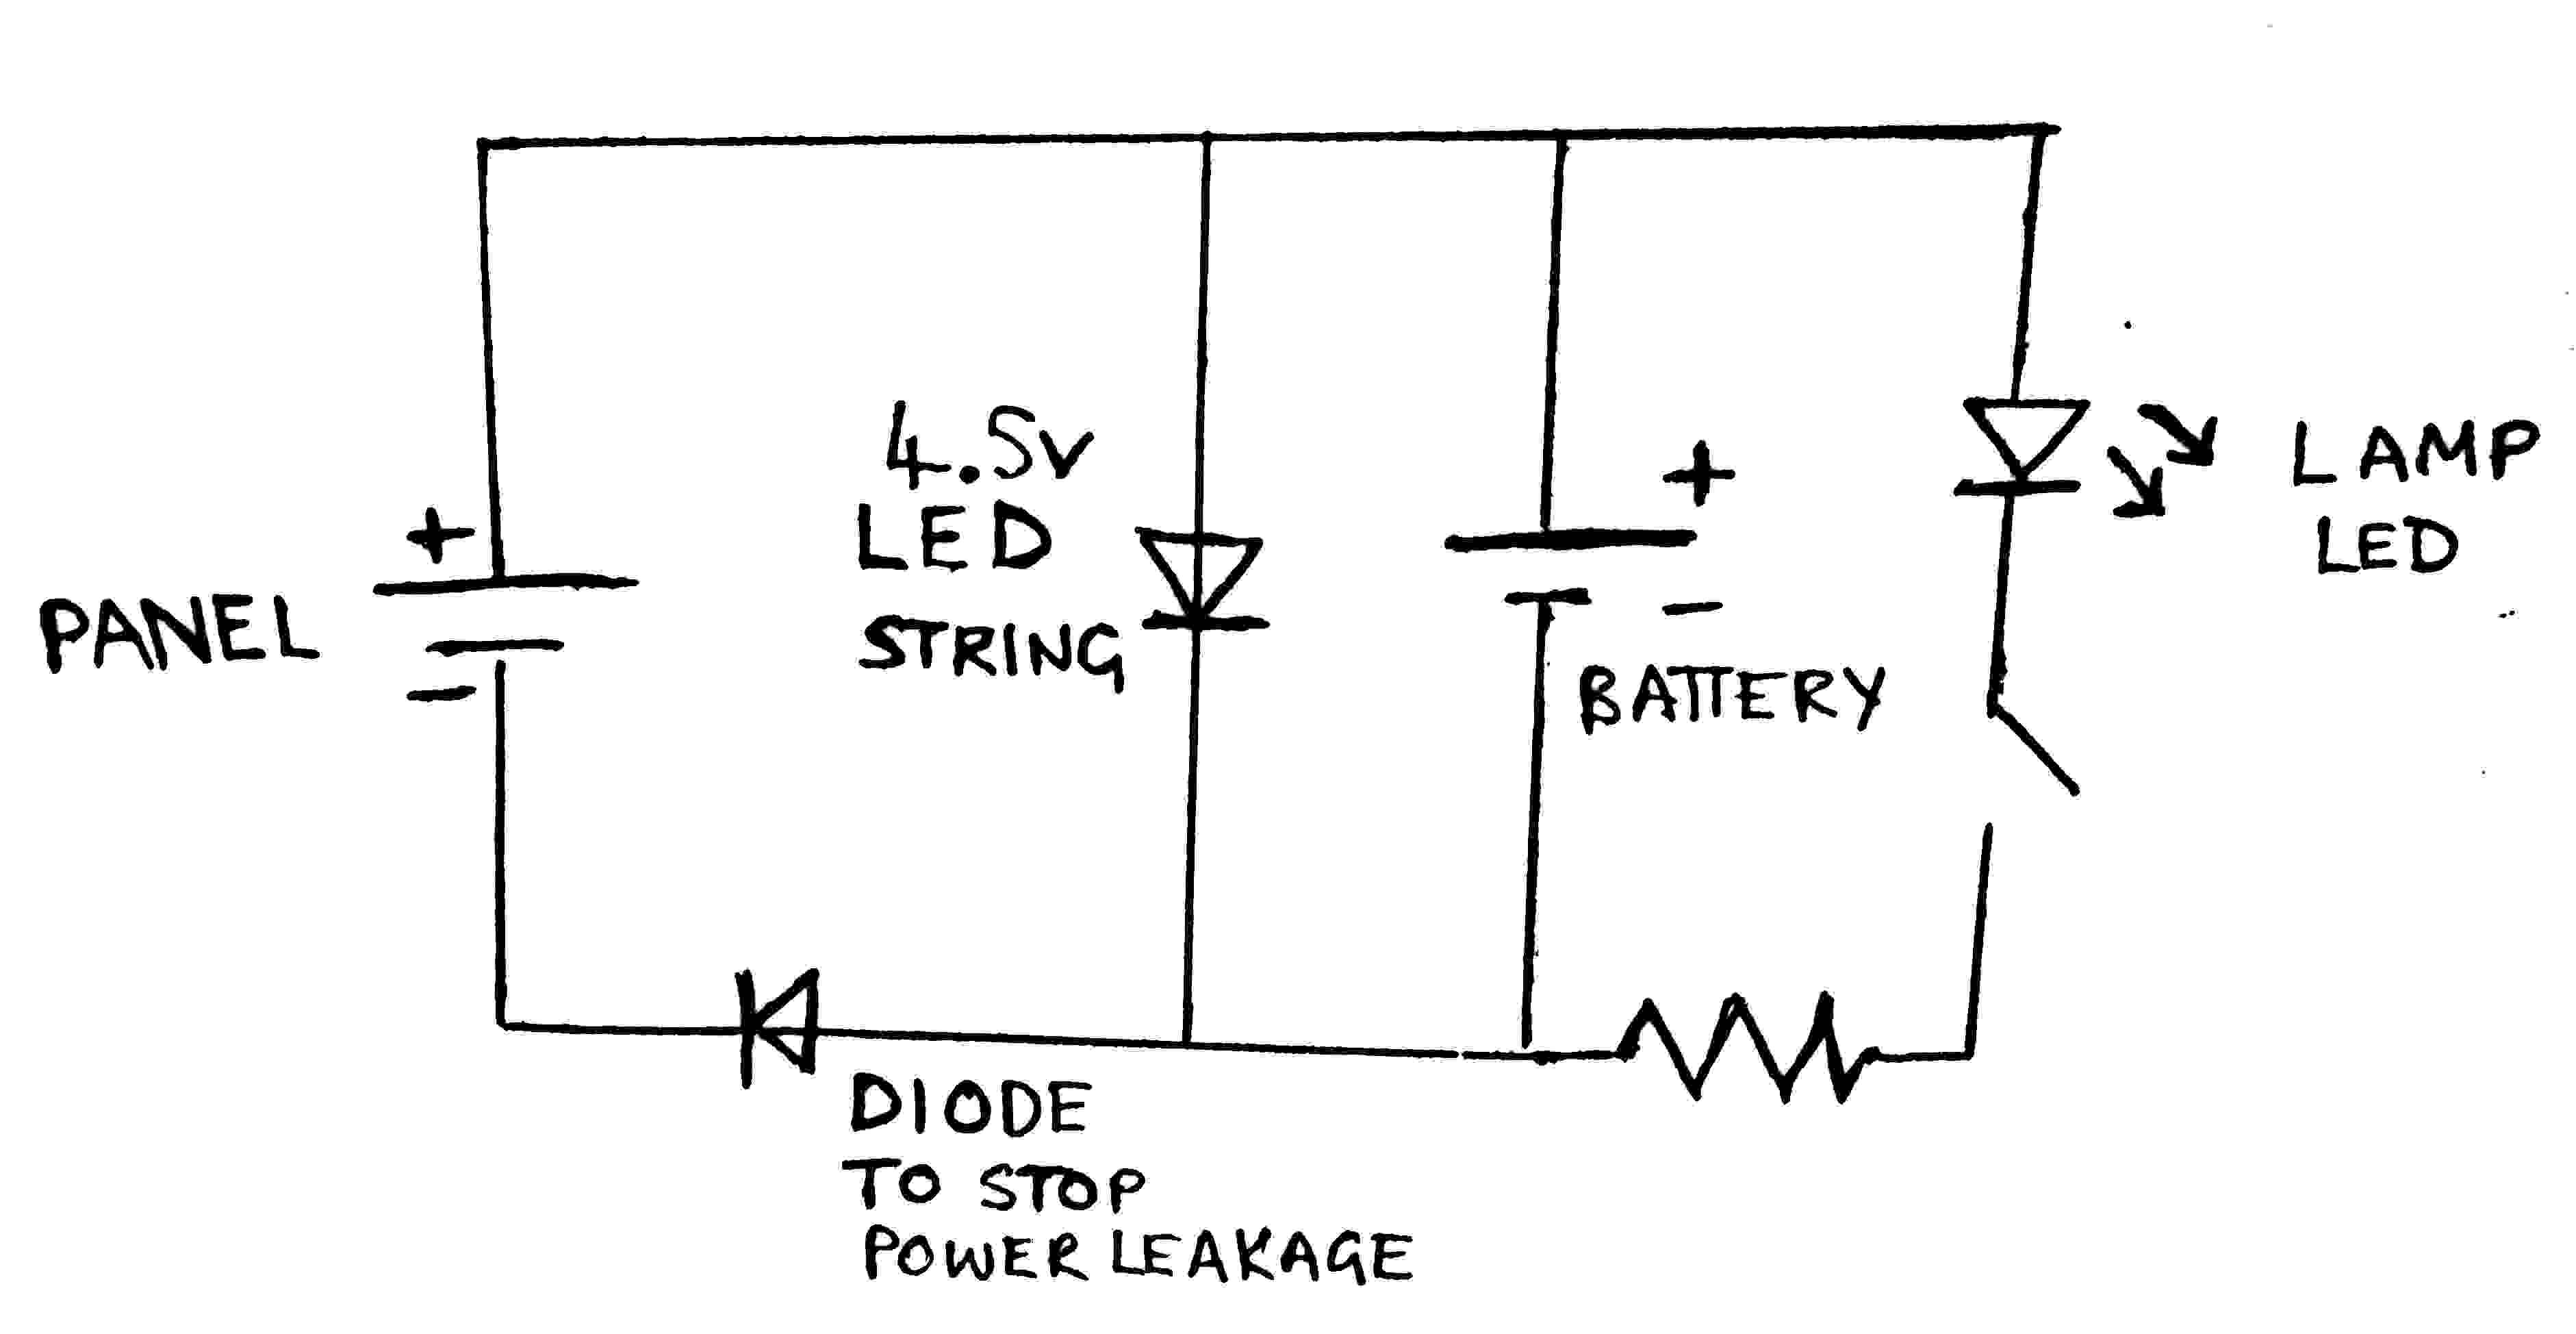 medium resolution of solar panel light wiring diagram data wiring diagram rh 3 hrc solarhandel de 12 volt solar wiring diagram simple solar light wiring diagram